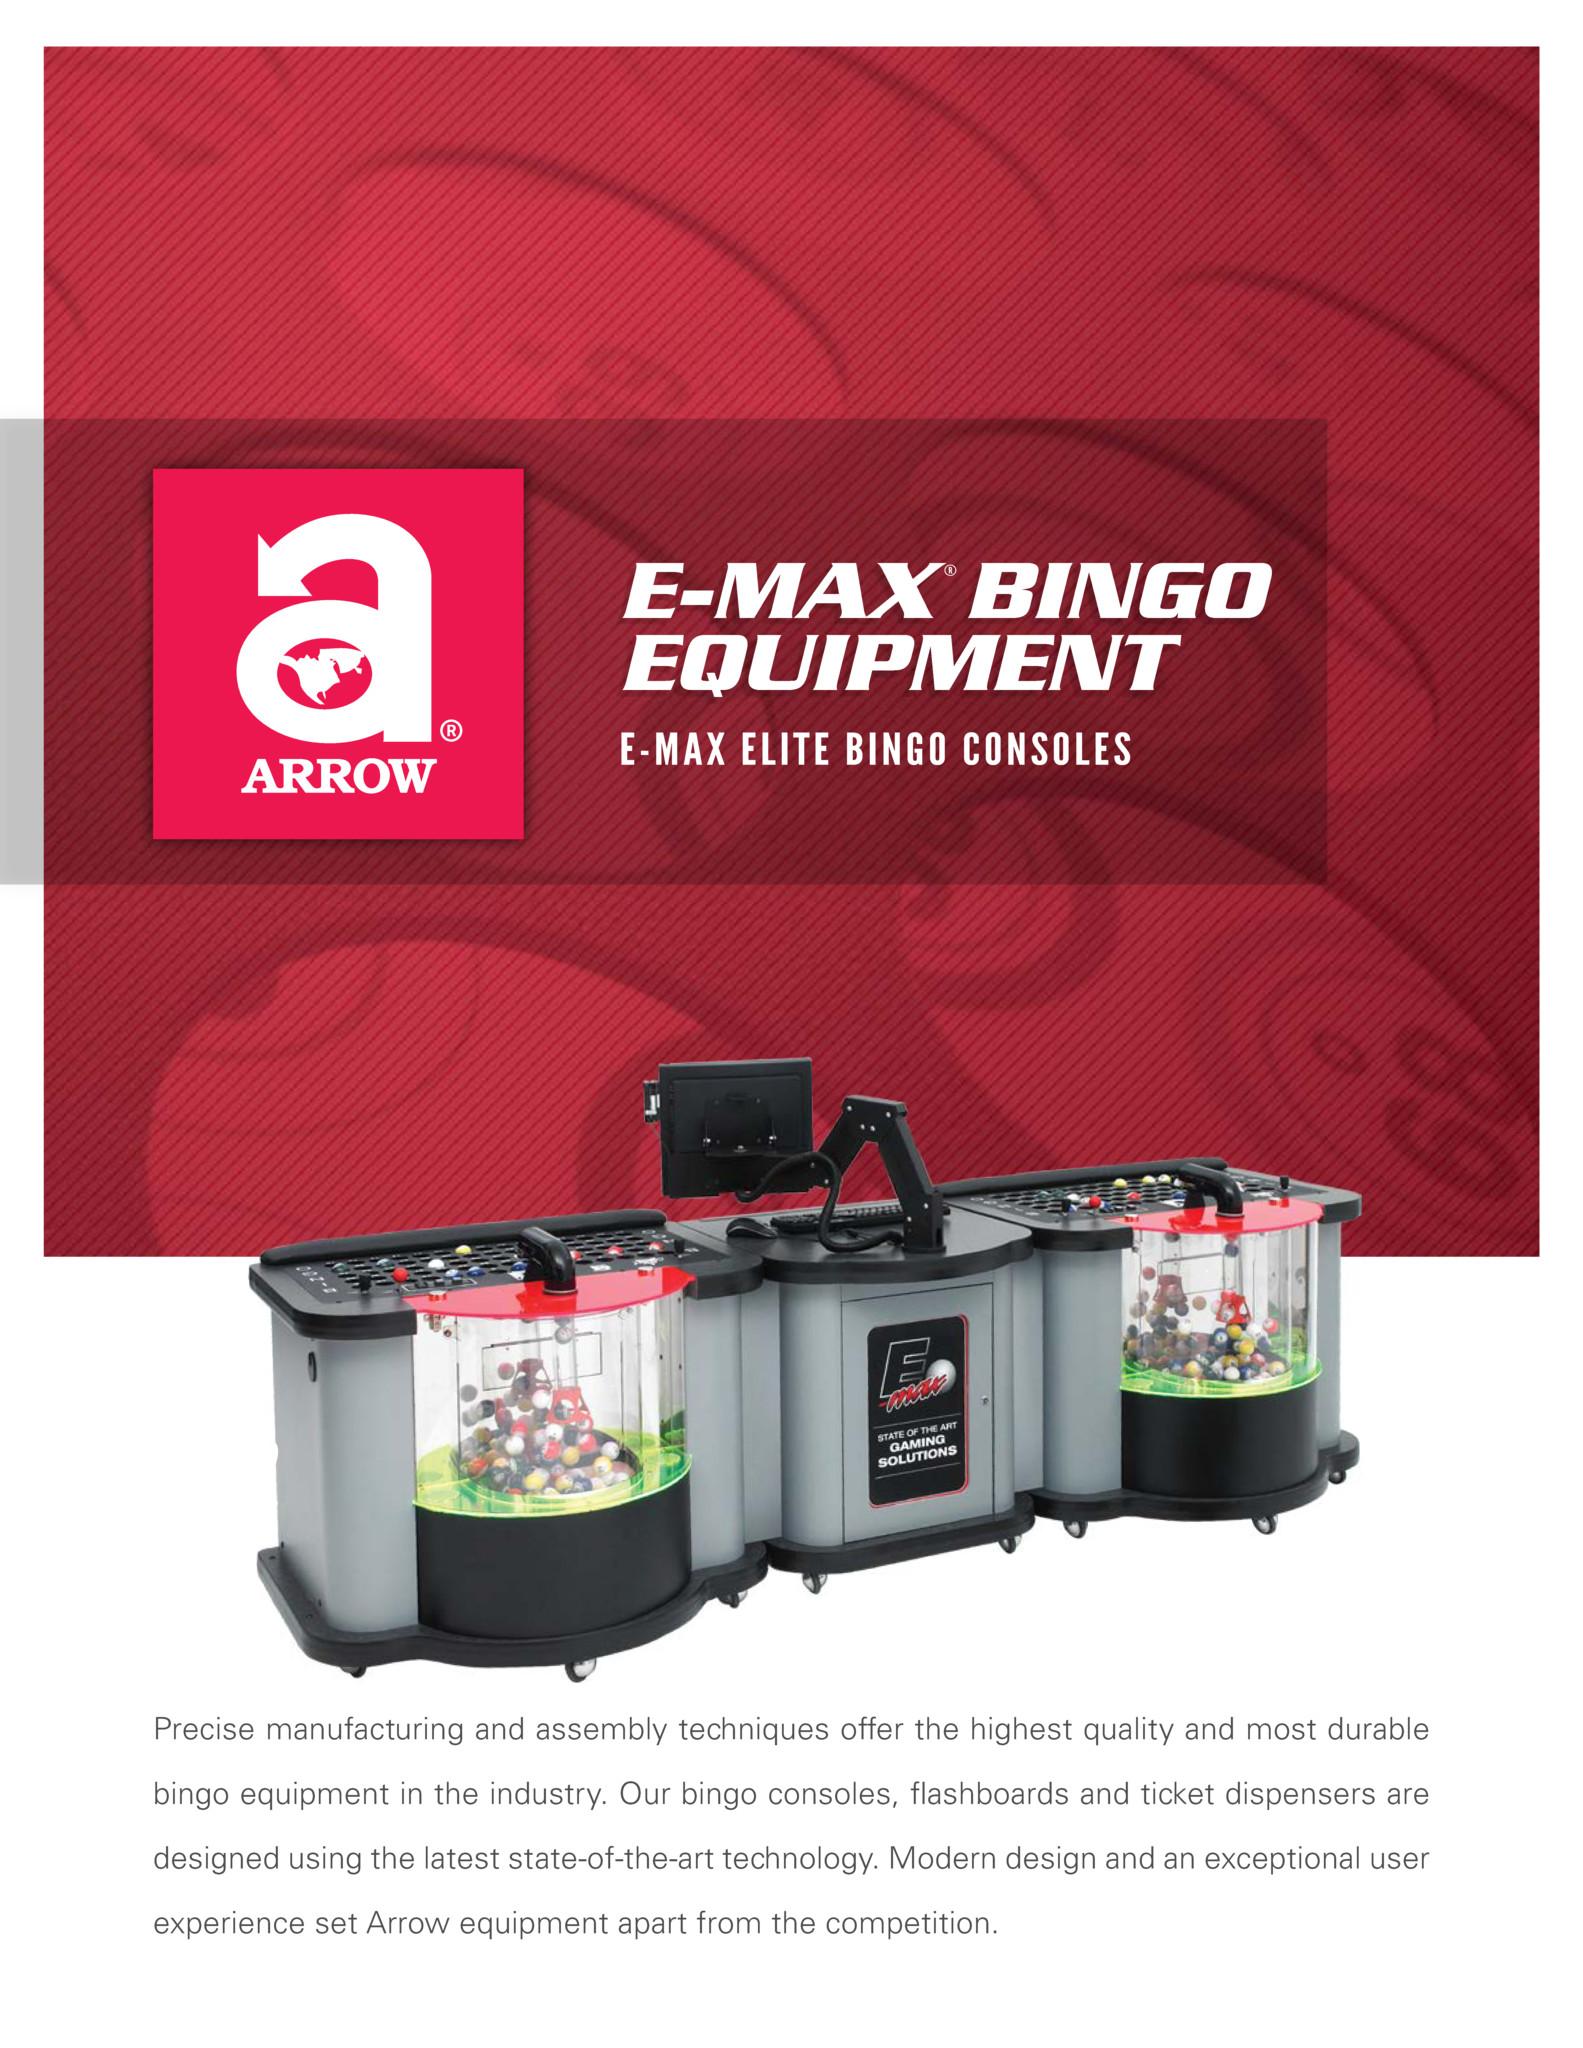 E-max Elite Bingo Console Flyer Promotional Materials/Equipment Flyers & Brochures